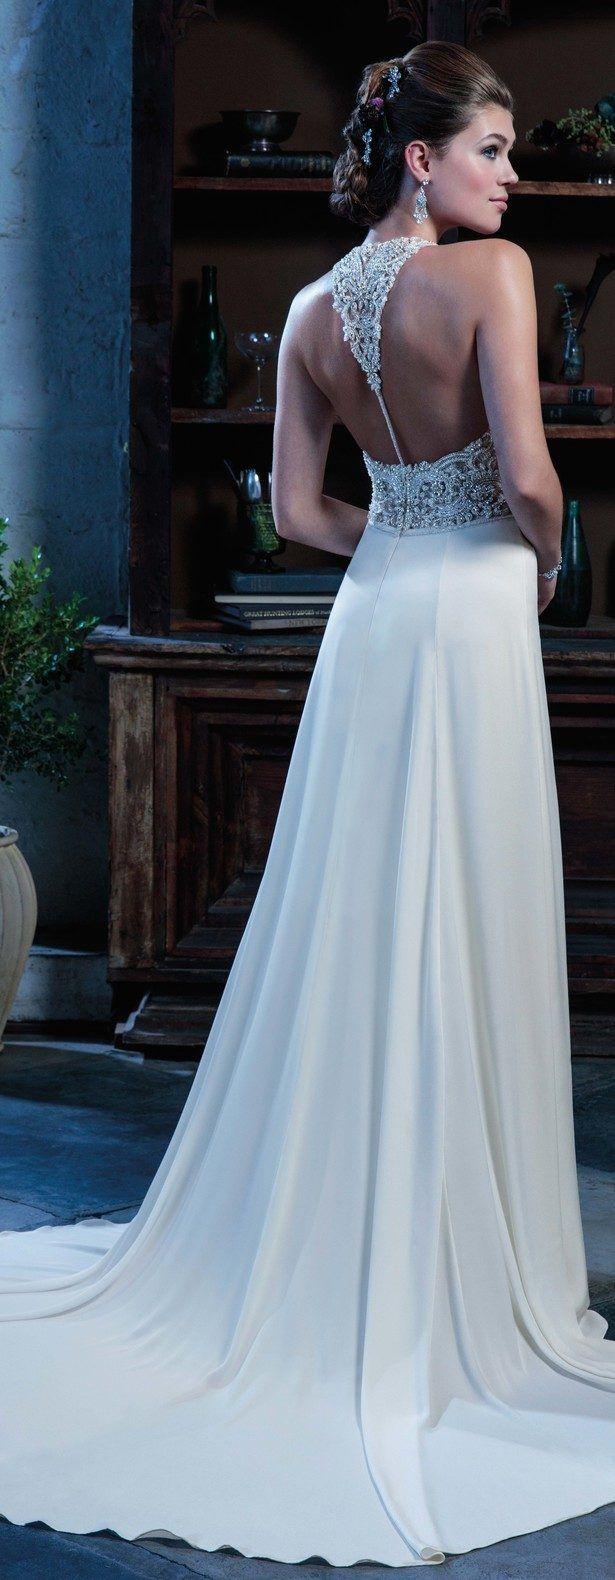 Excellent Wedding Dresses Concord Nc Photos - Wedding Ideas ...